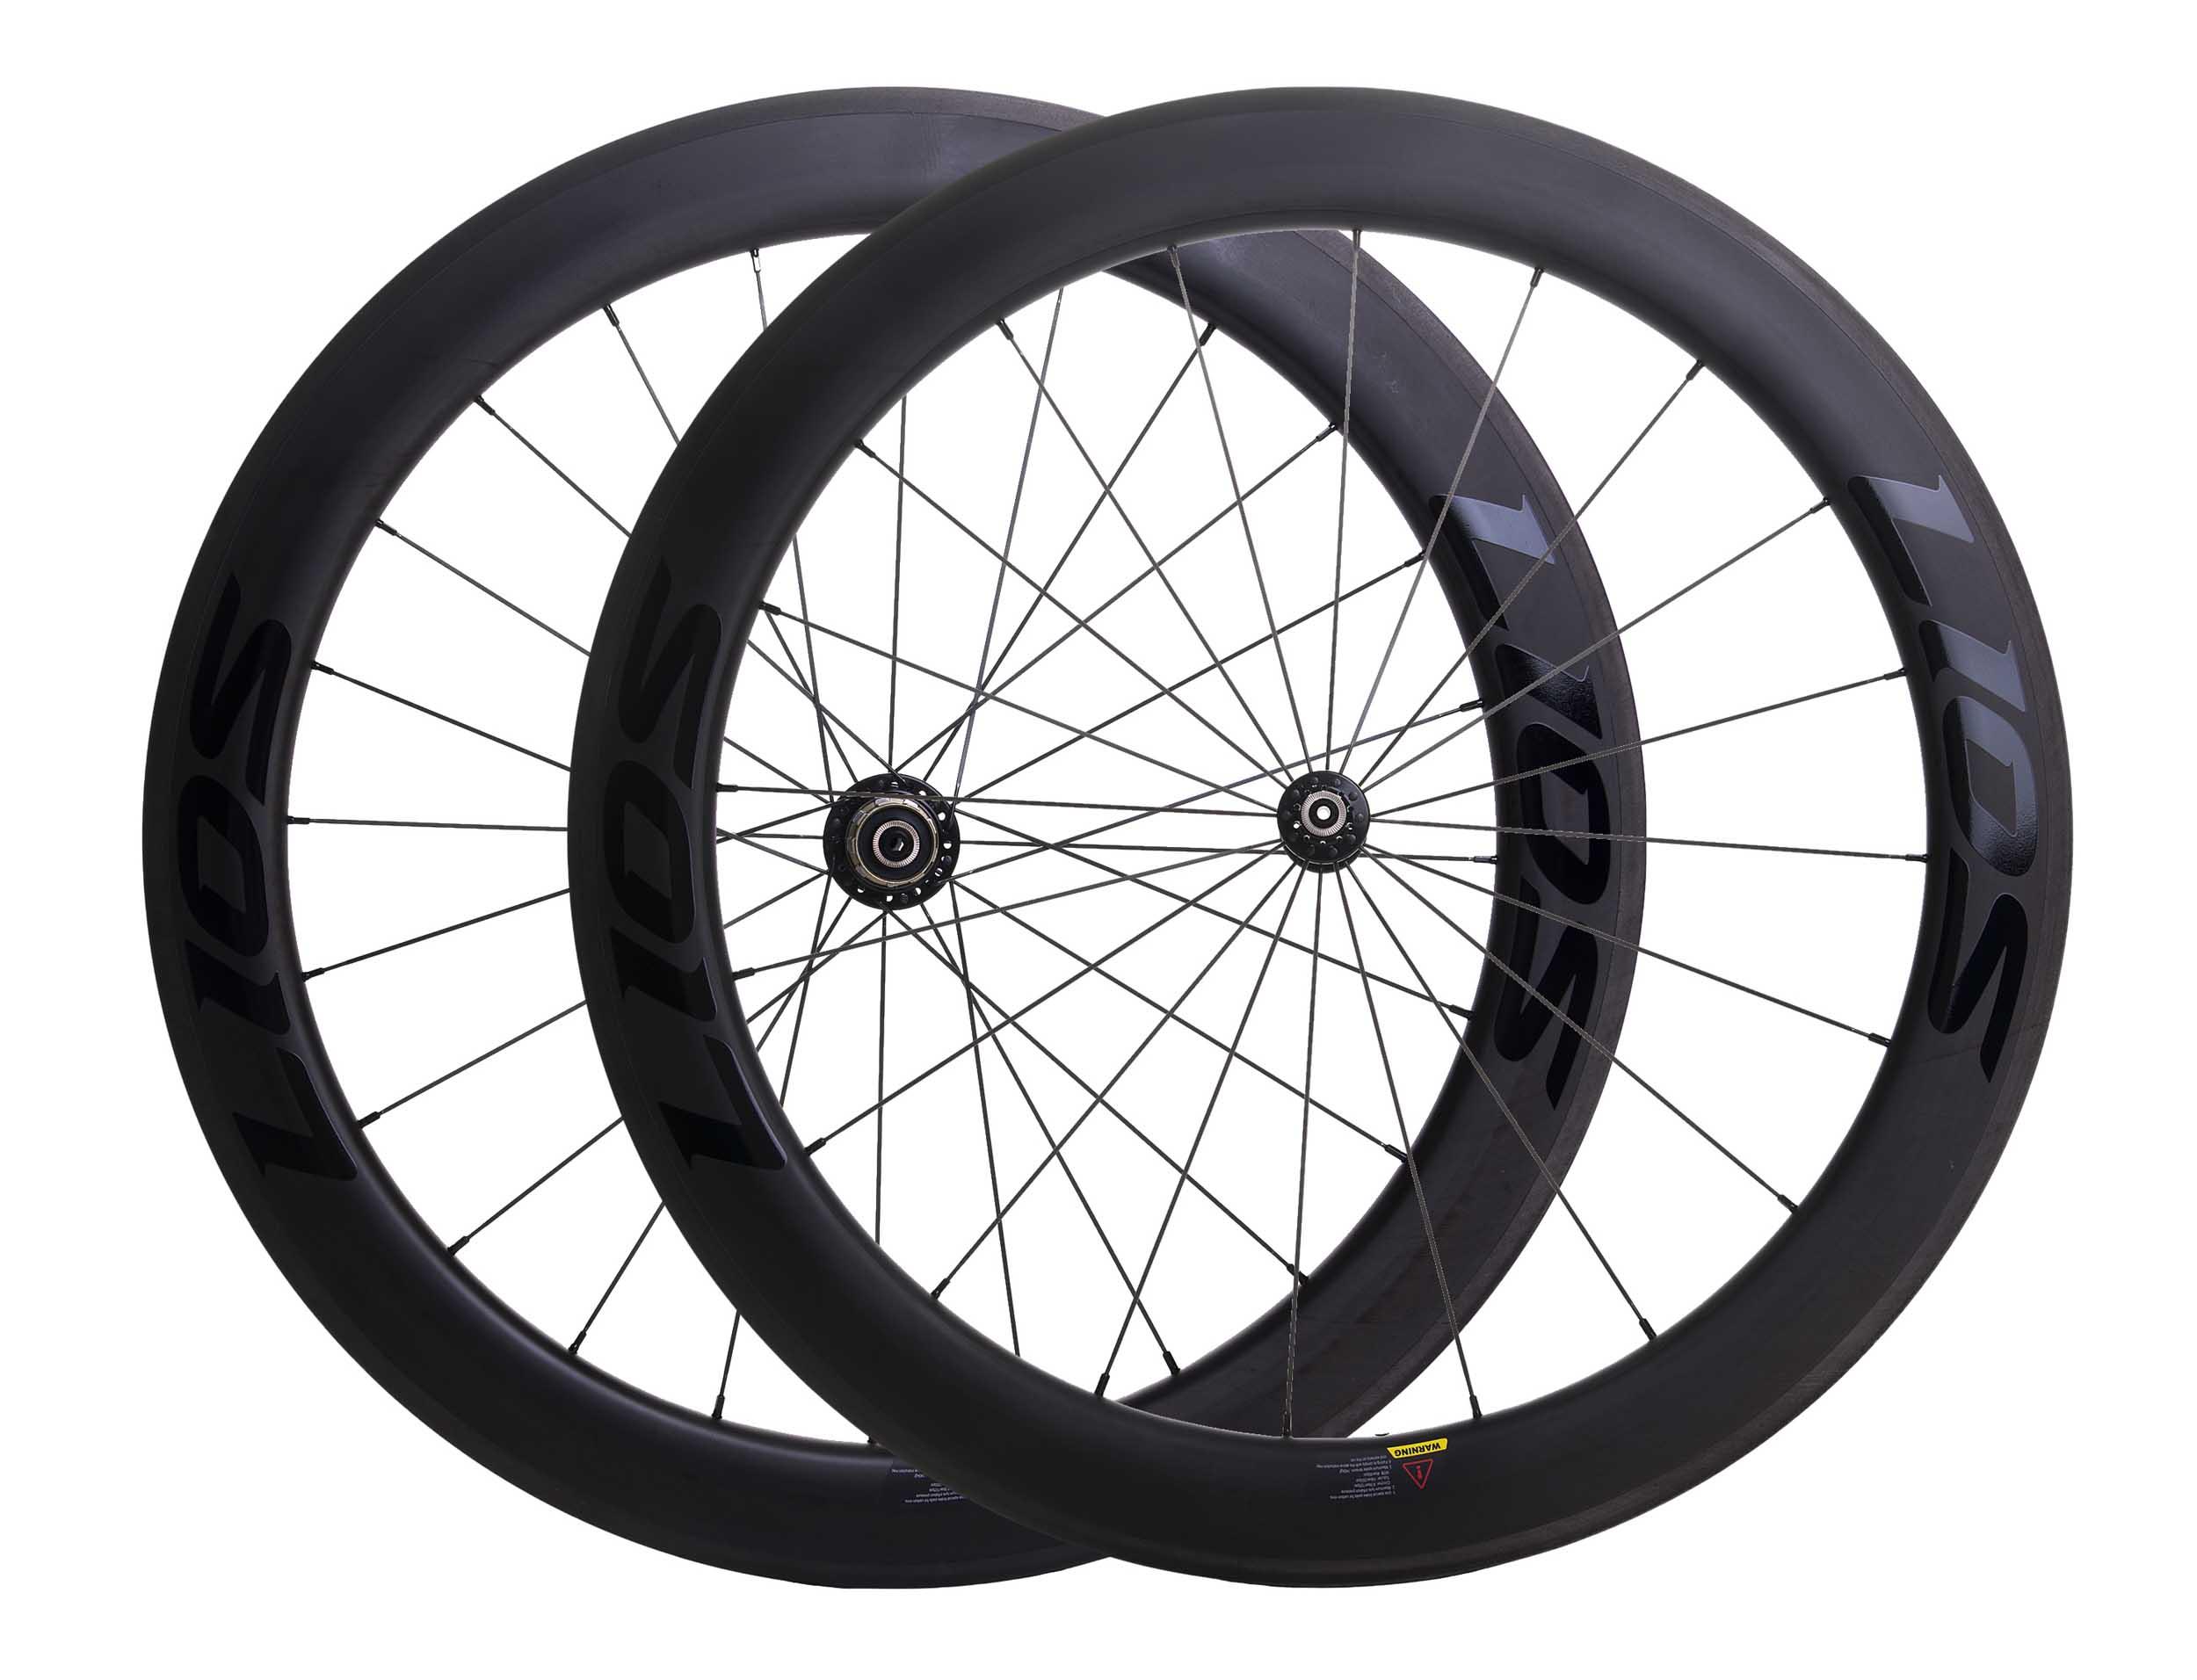 lios-c60-carbon-wheelset-black-image-1.jpg